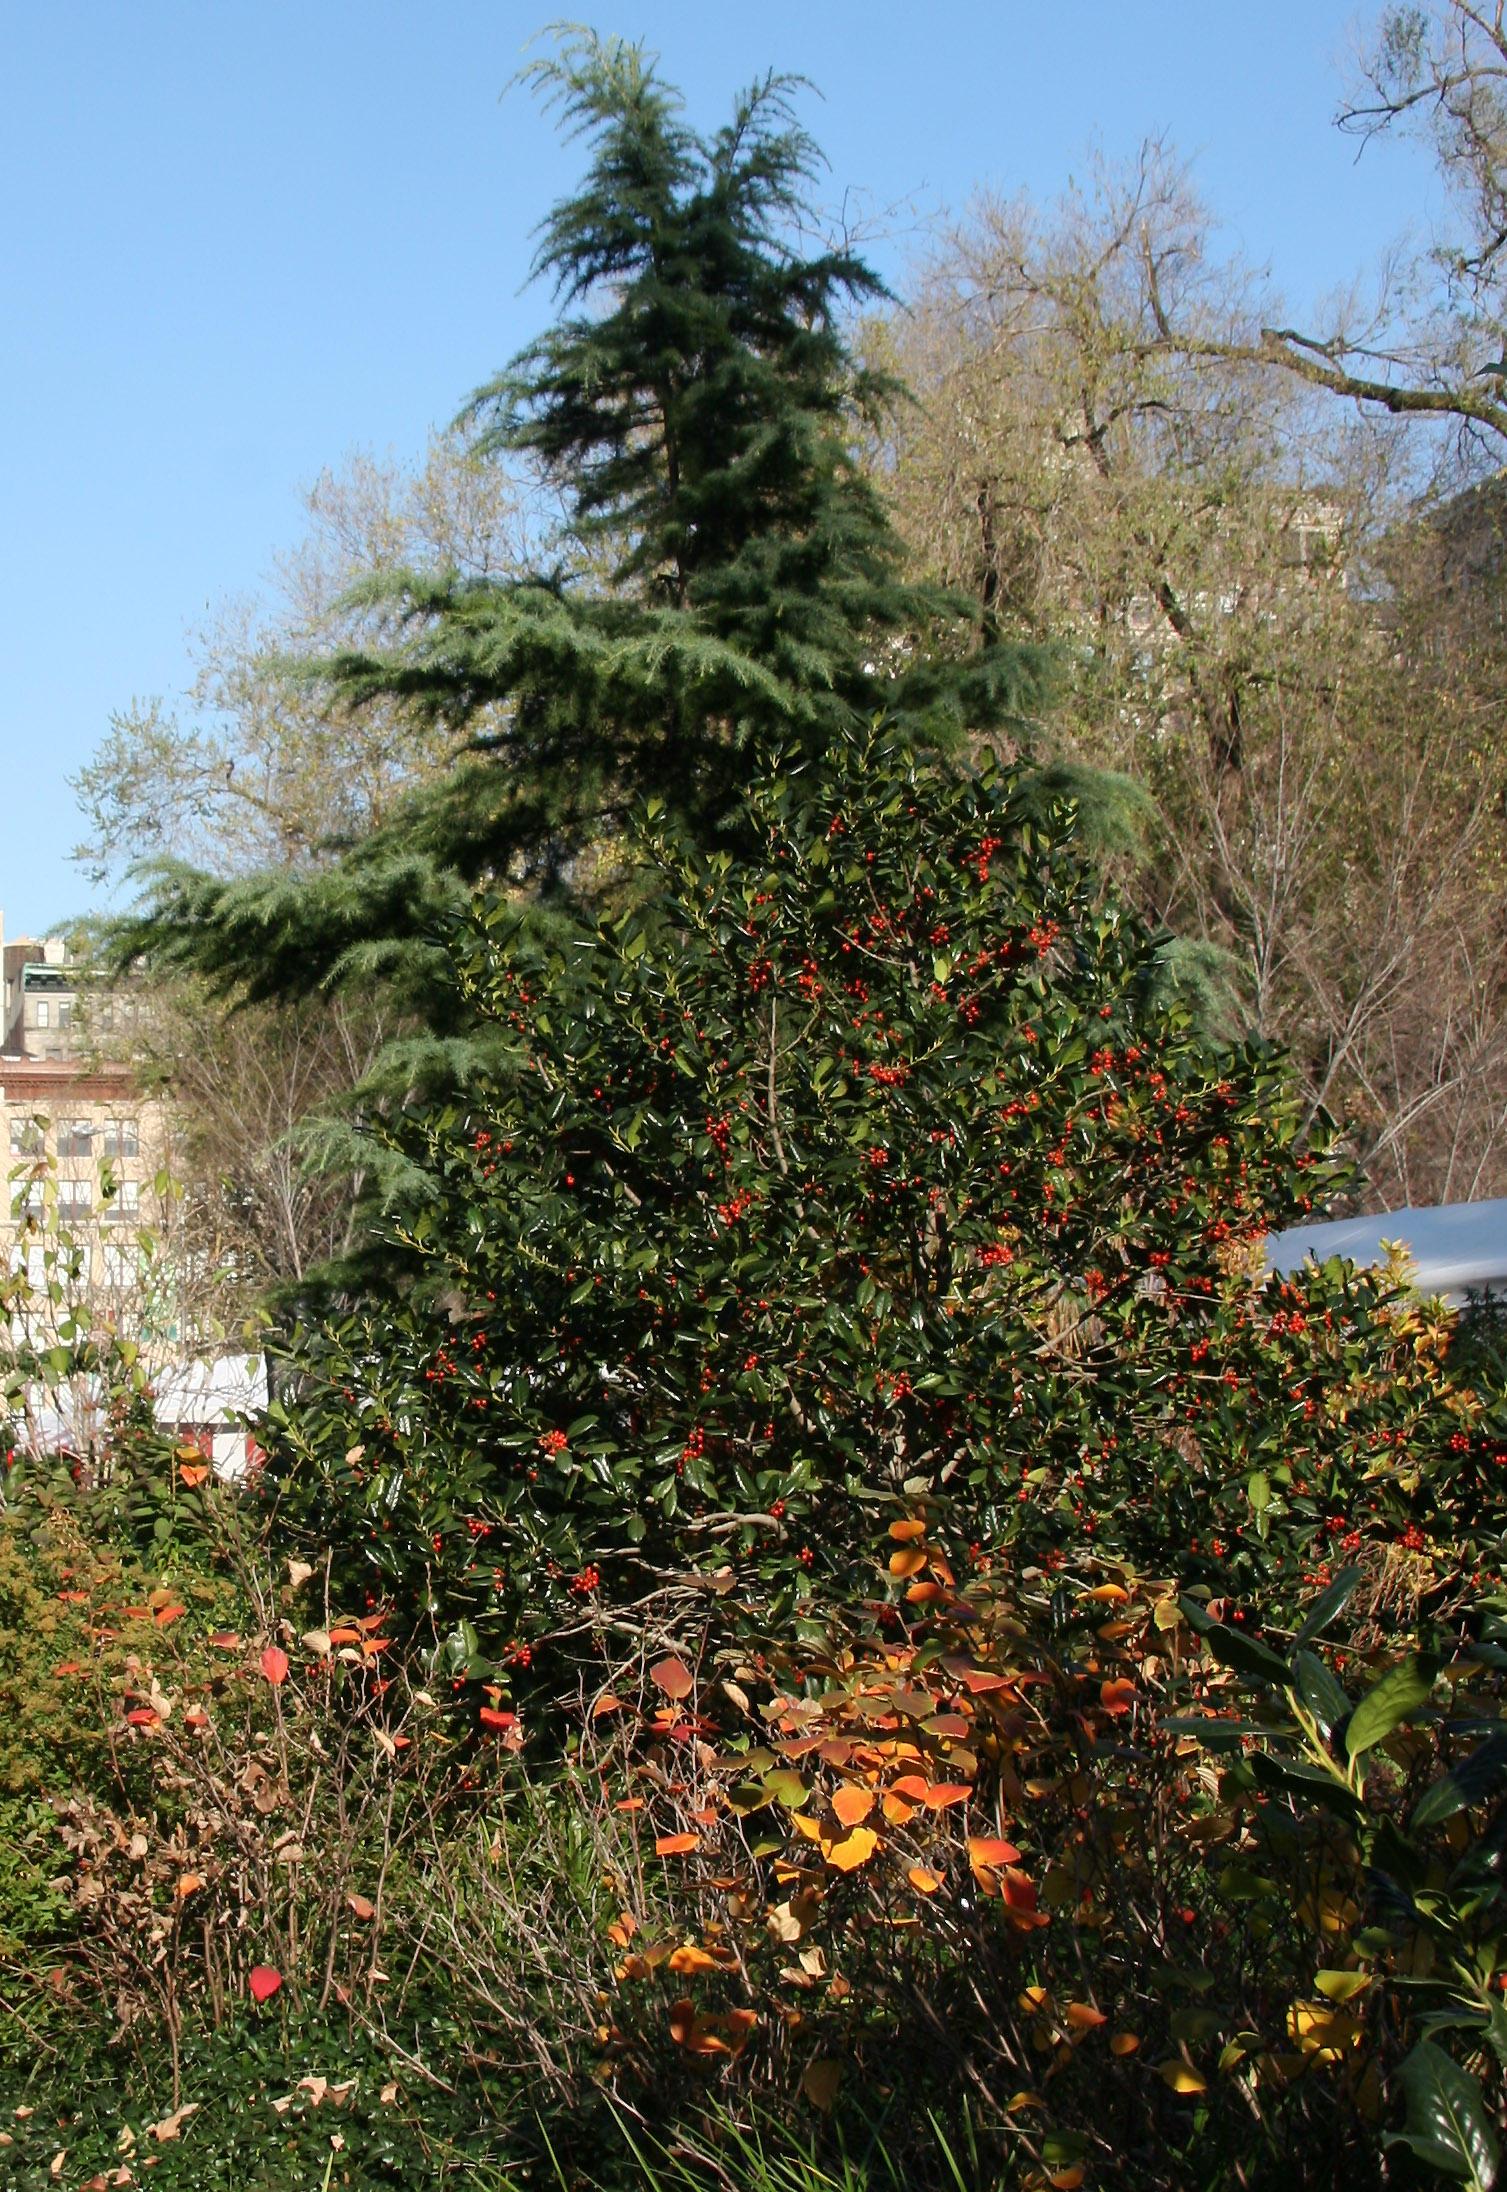 Fothergilla Bush, Holly & Pine Trees